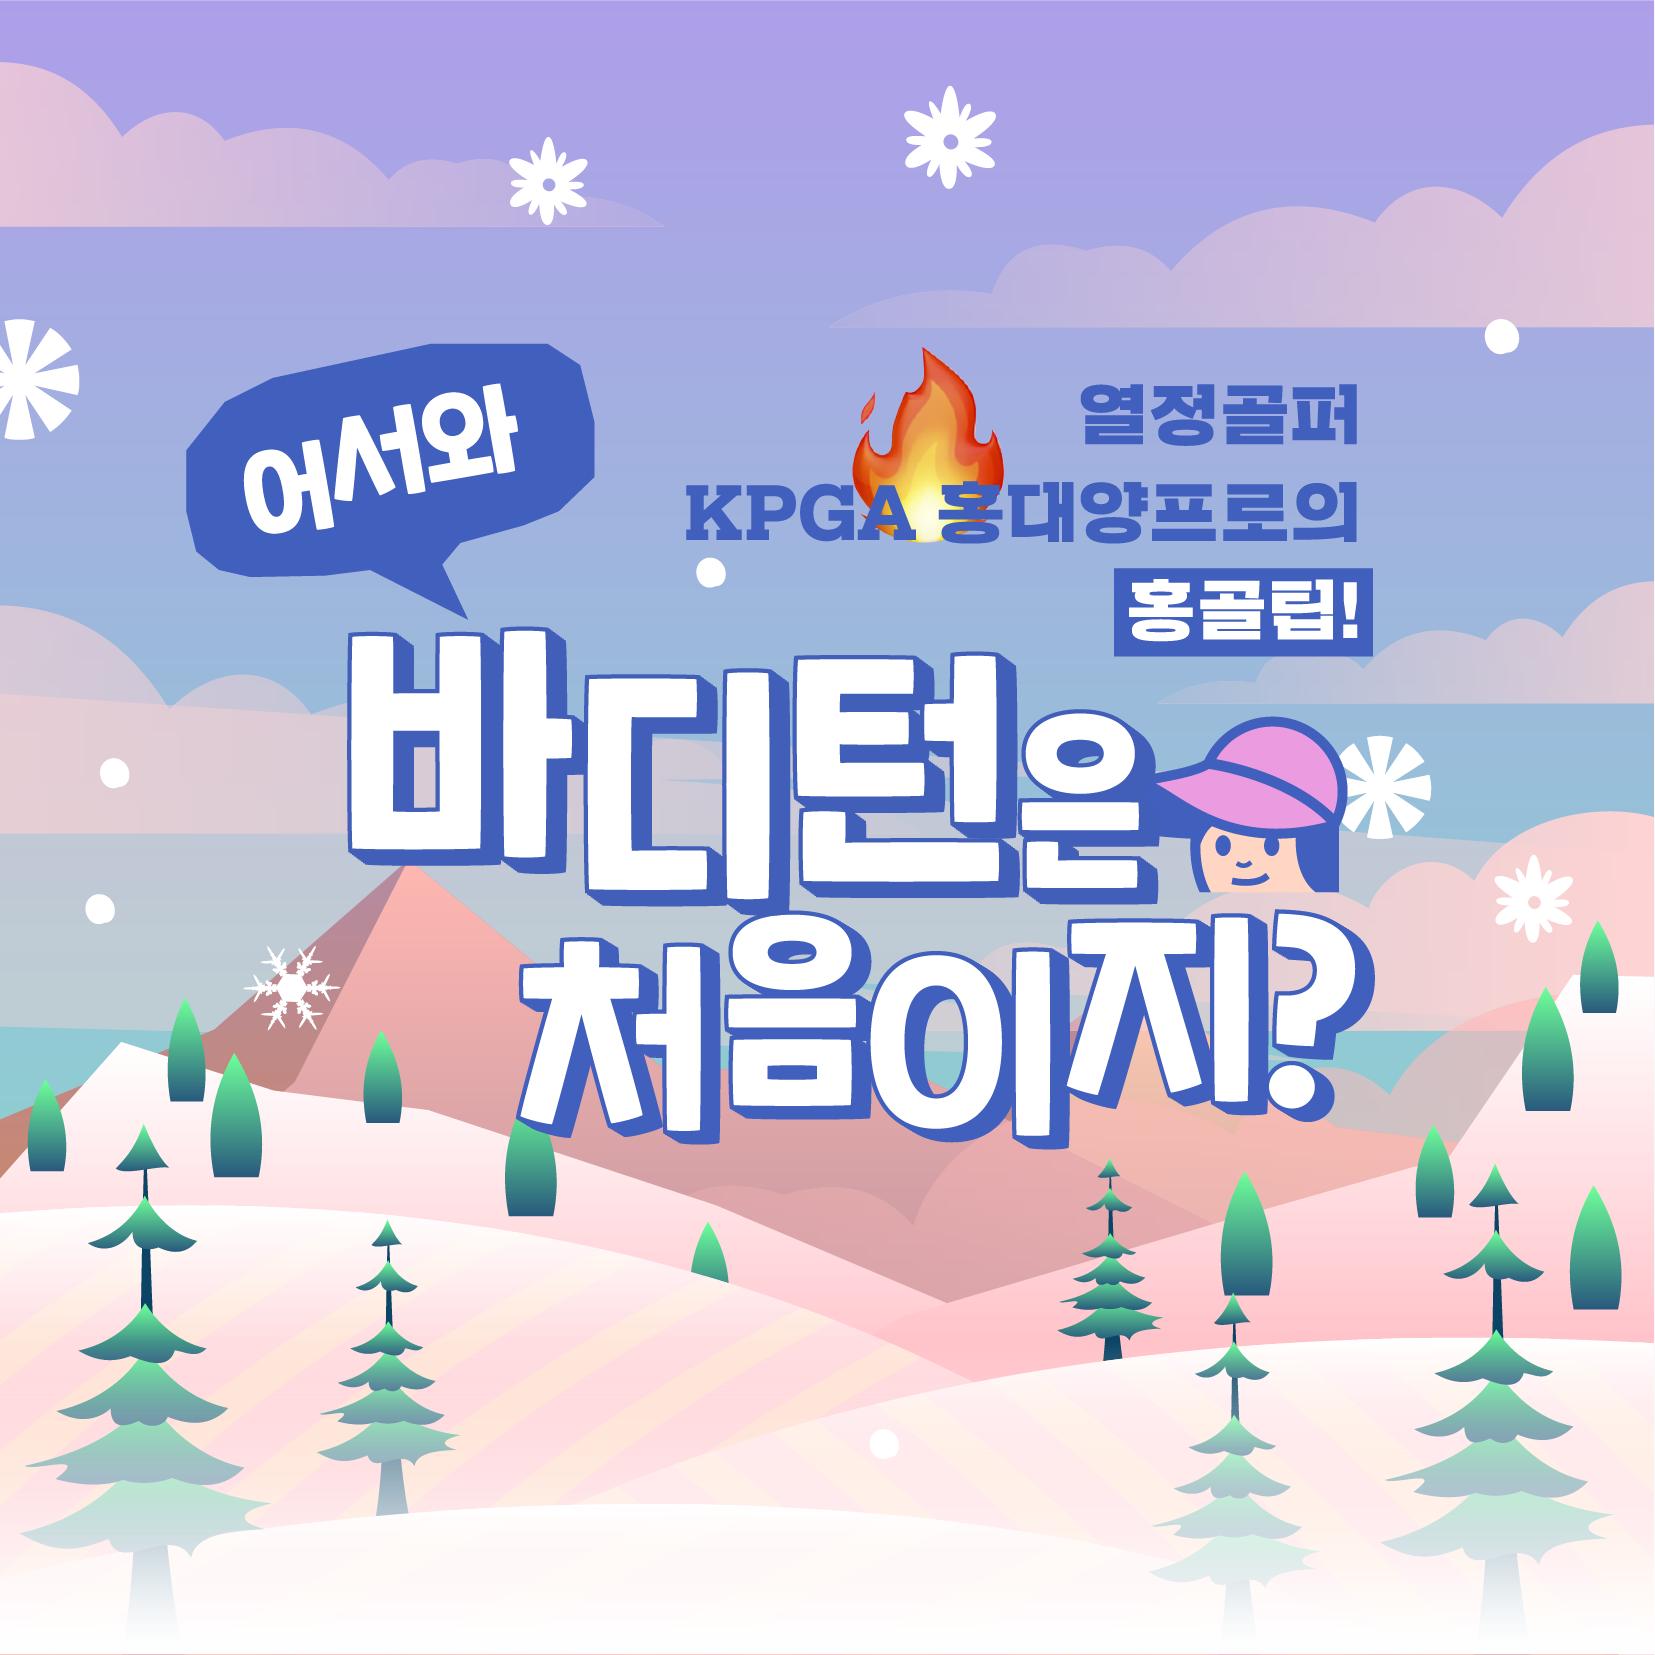 kpga-홍대양-프로-x-김캐디-바디턴은-처음이지-바디턴-꿀팁-홍골팁-6탄